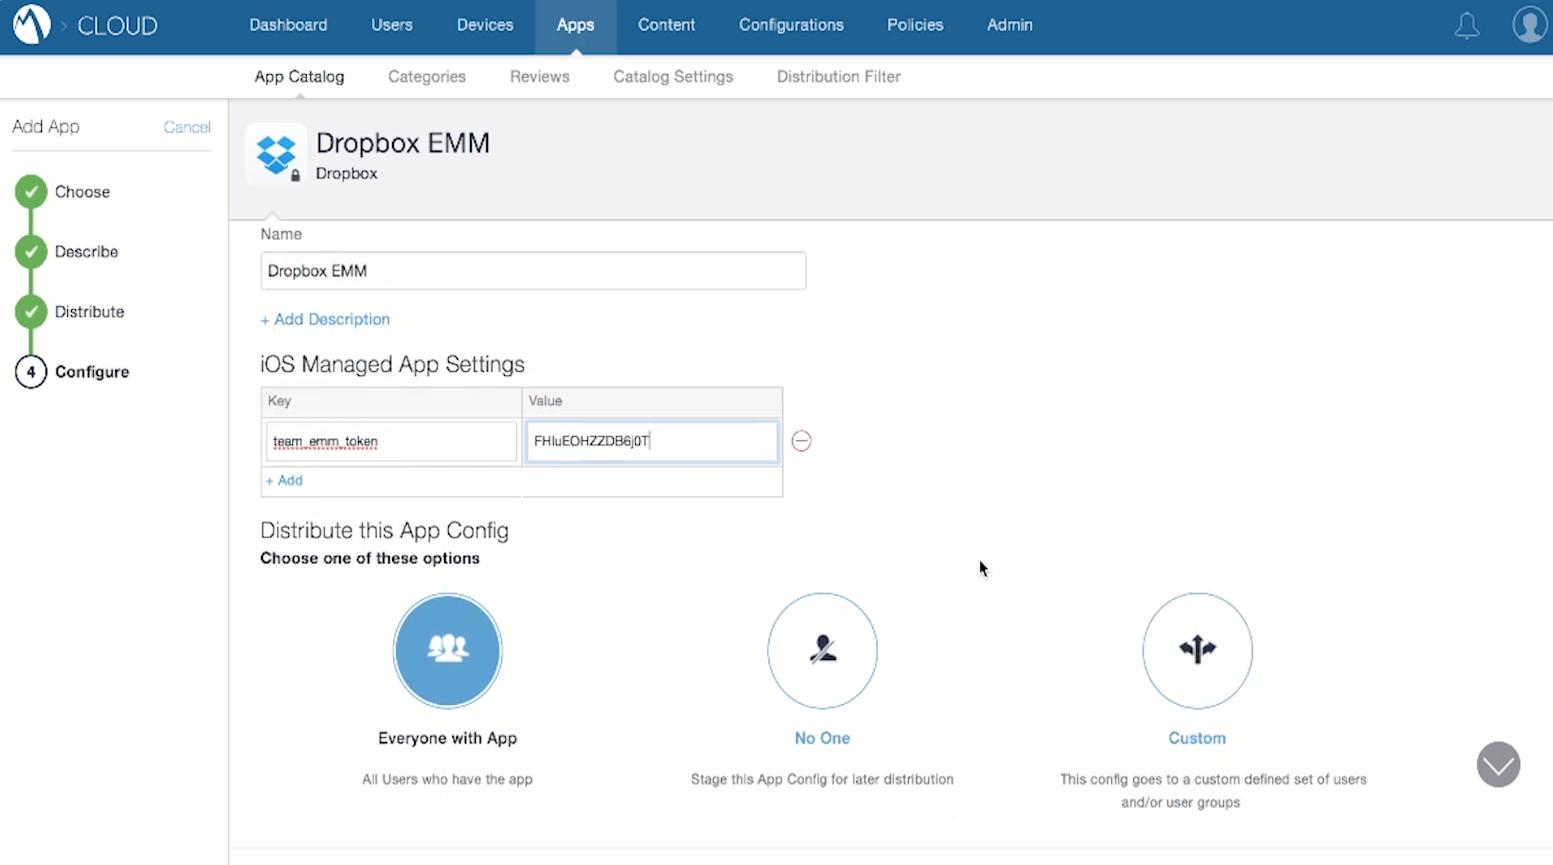 MobileIron configure Dropbox EMM